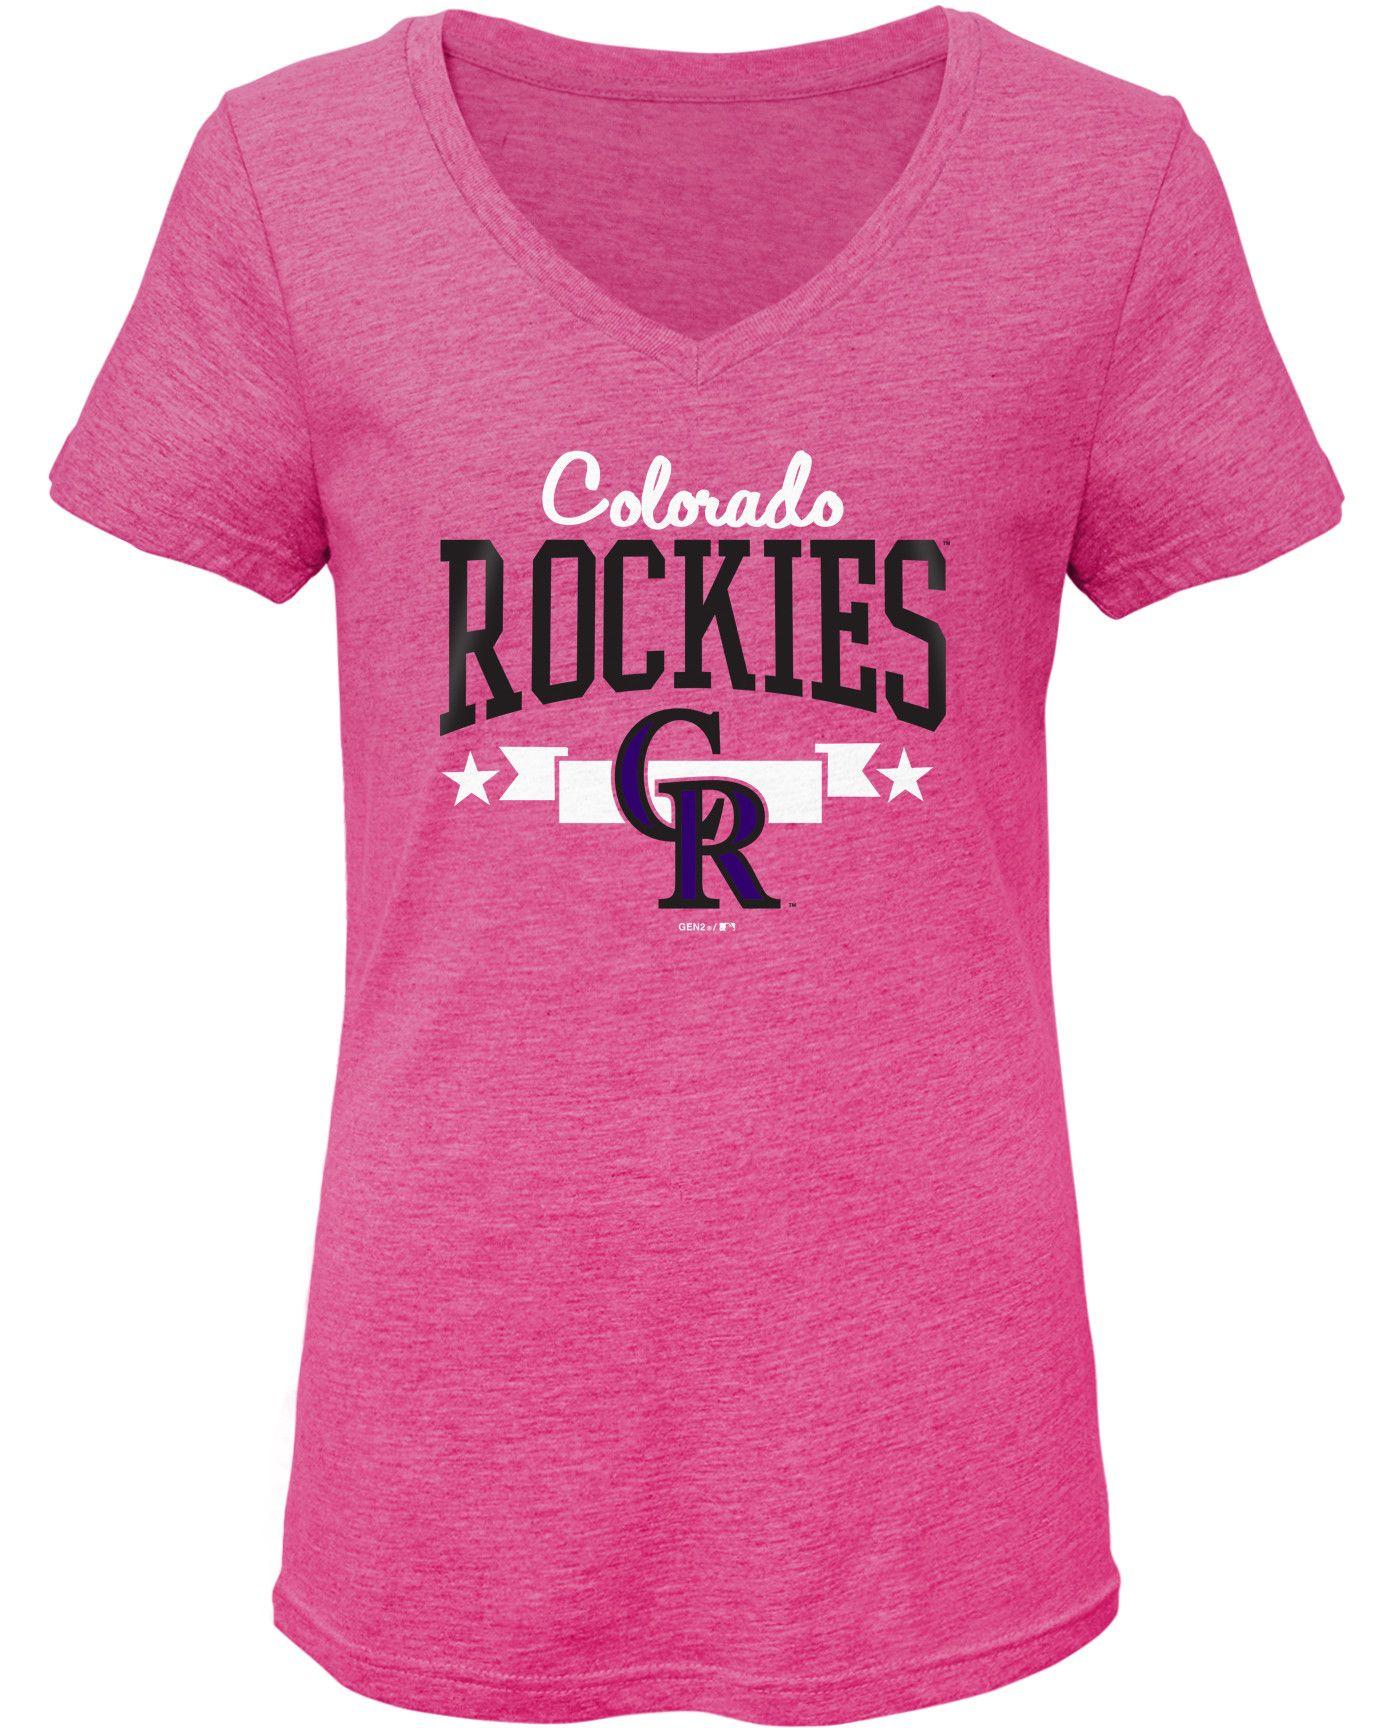 Gen2 Youth Girls' Colorado Rockies Pink Tri-Blend V-Neck T-Shirt